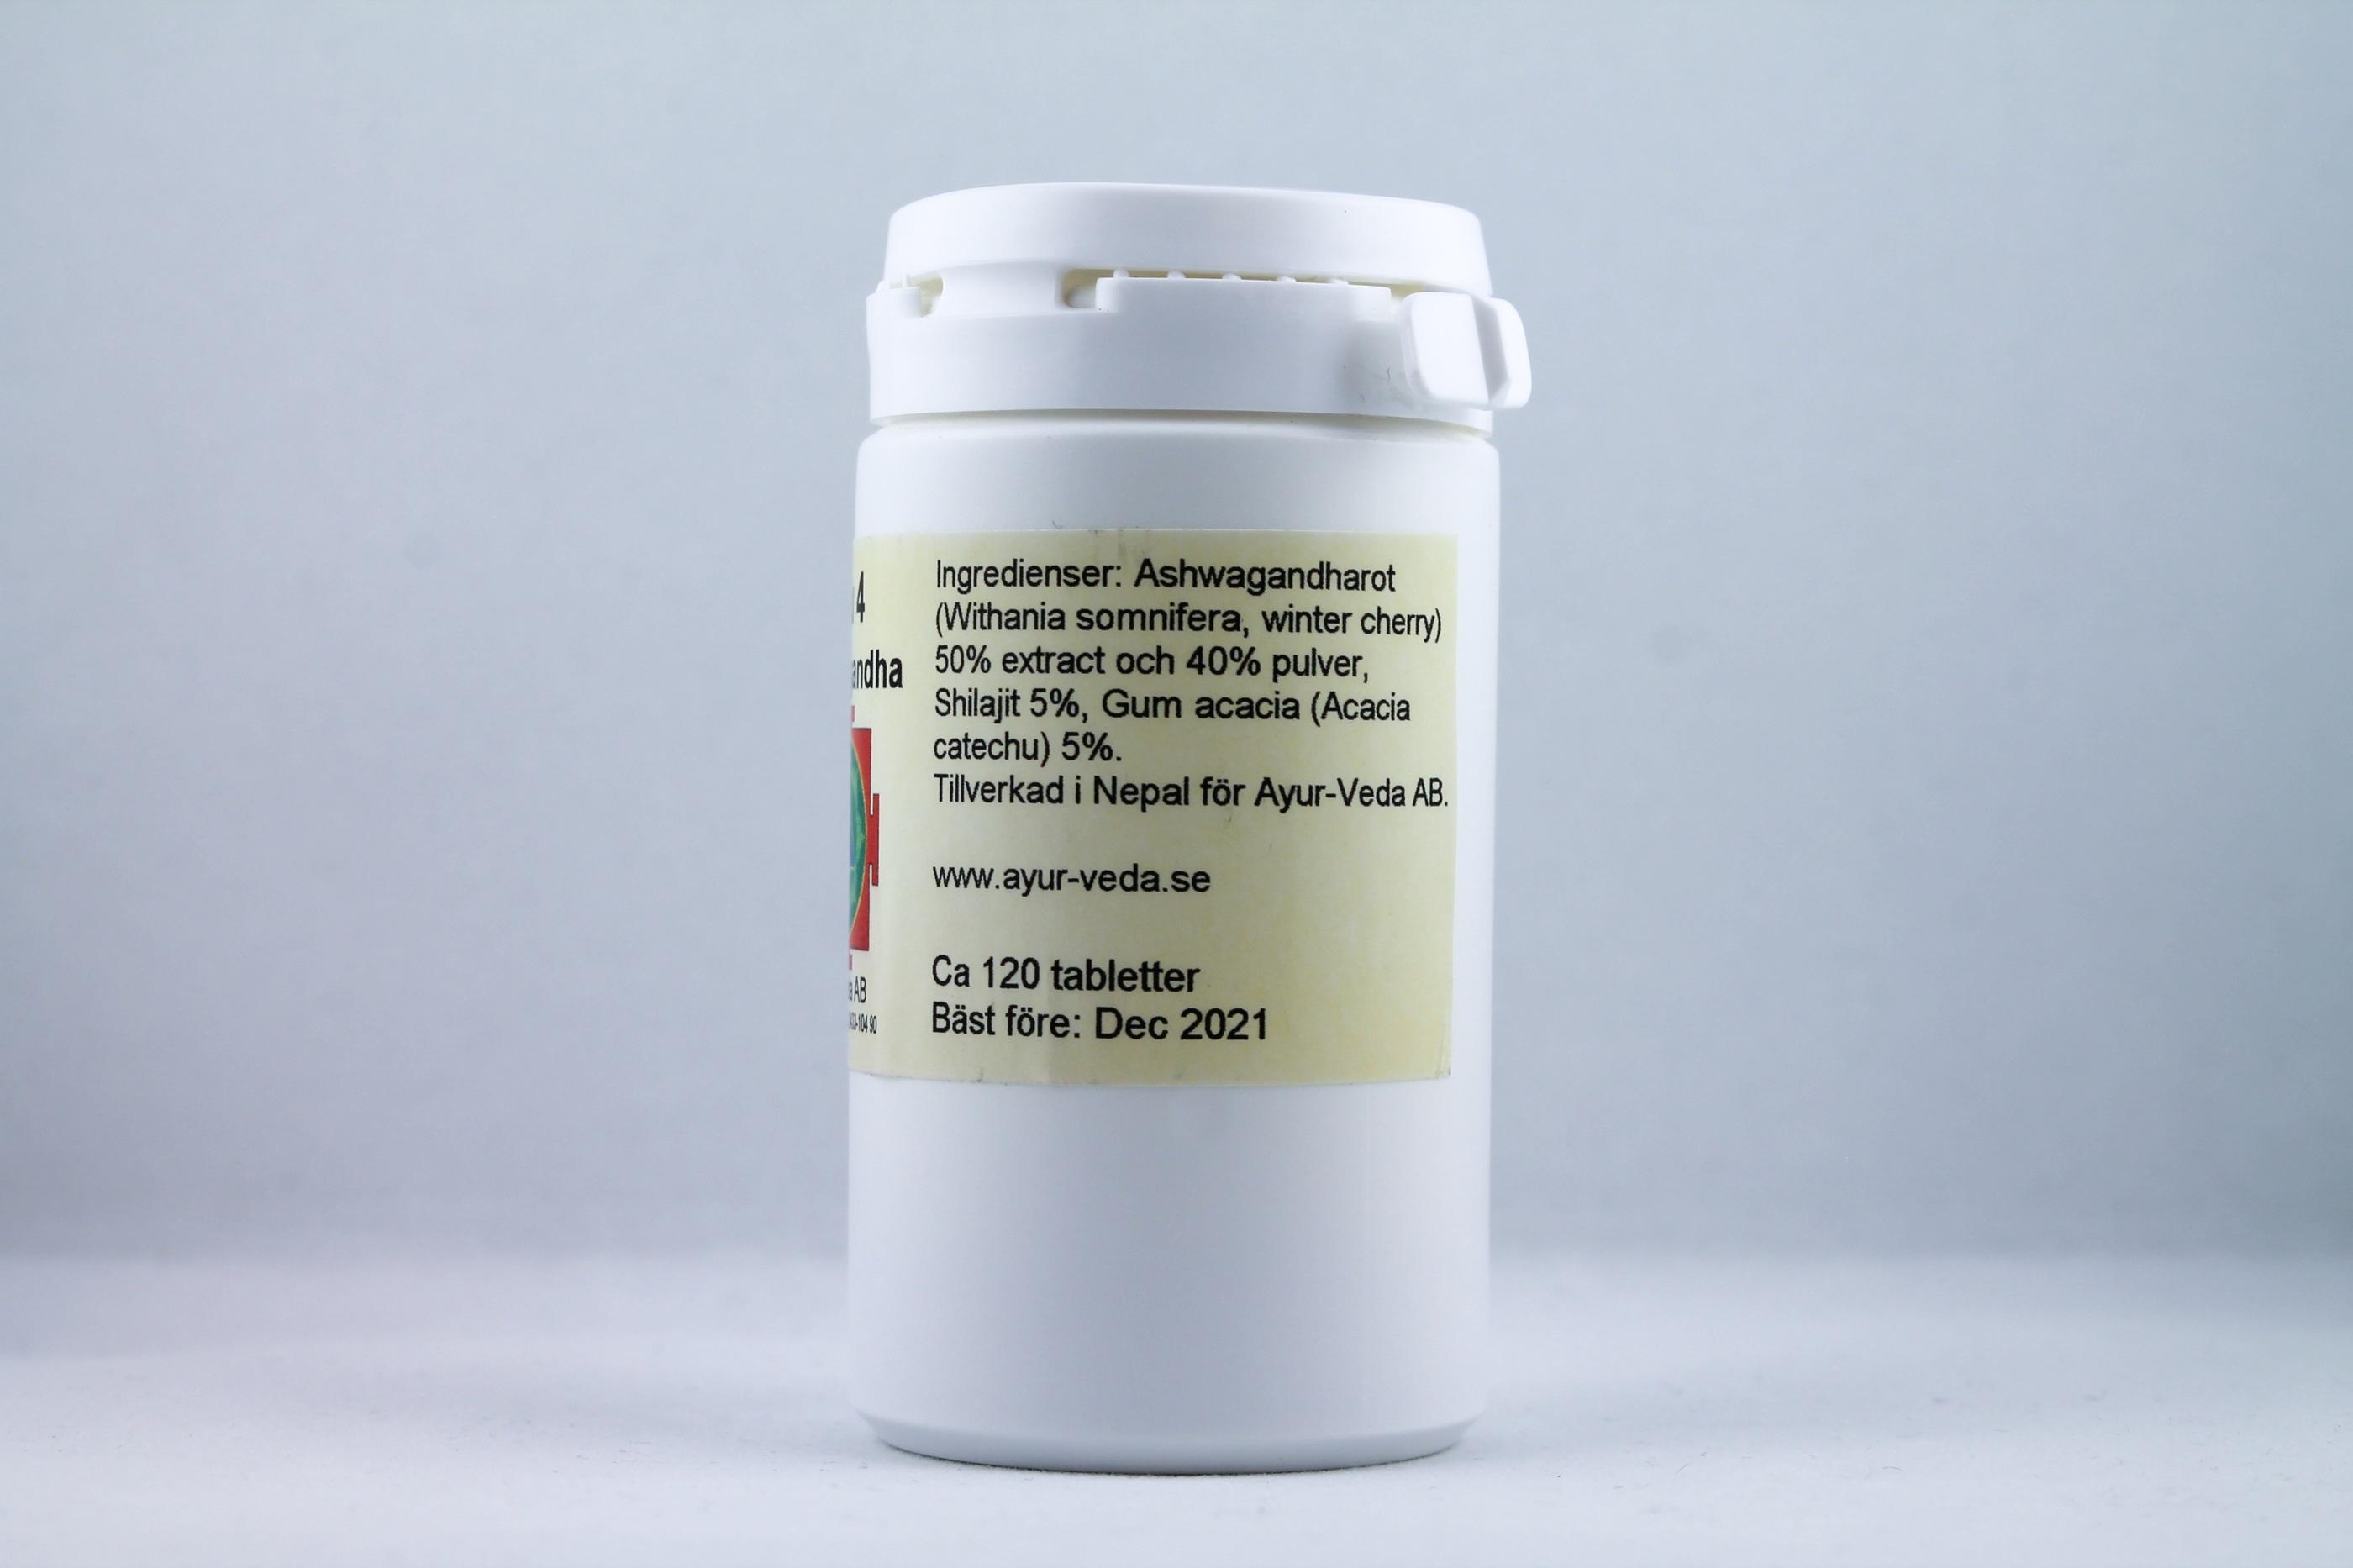 Ashwagandha tabletter holistisk homeopati alternativ hälsa Wellness Ayurveda Halmstadmassören Halmstad Sverige Sweden svensk tabletter